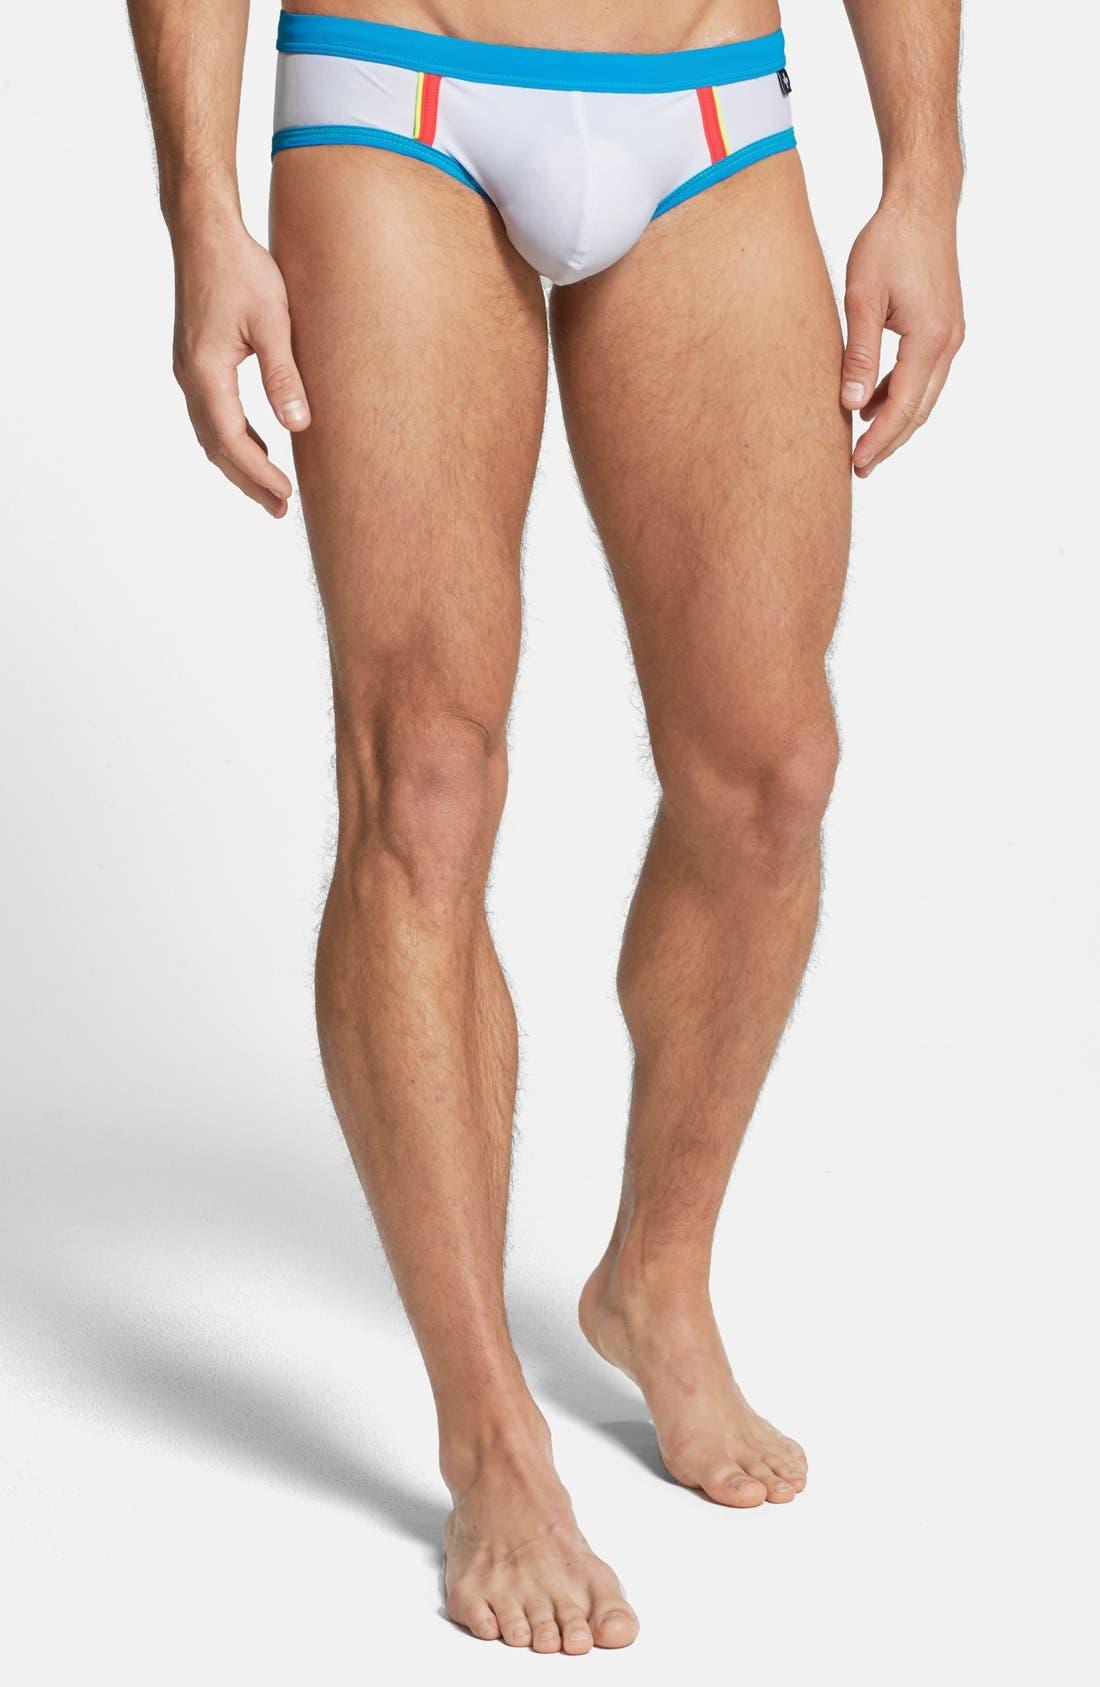 Alternate Image 1 Selected - Andrew Christian 'Almost Naked' Bikini Swim Briefs